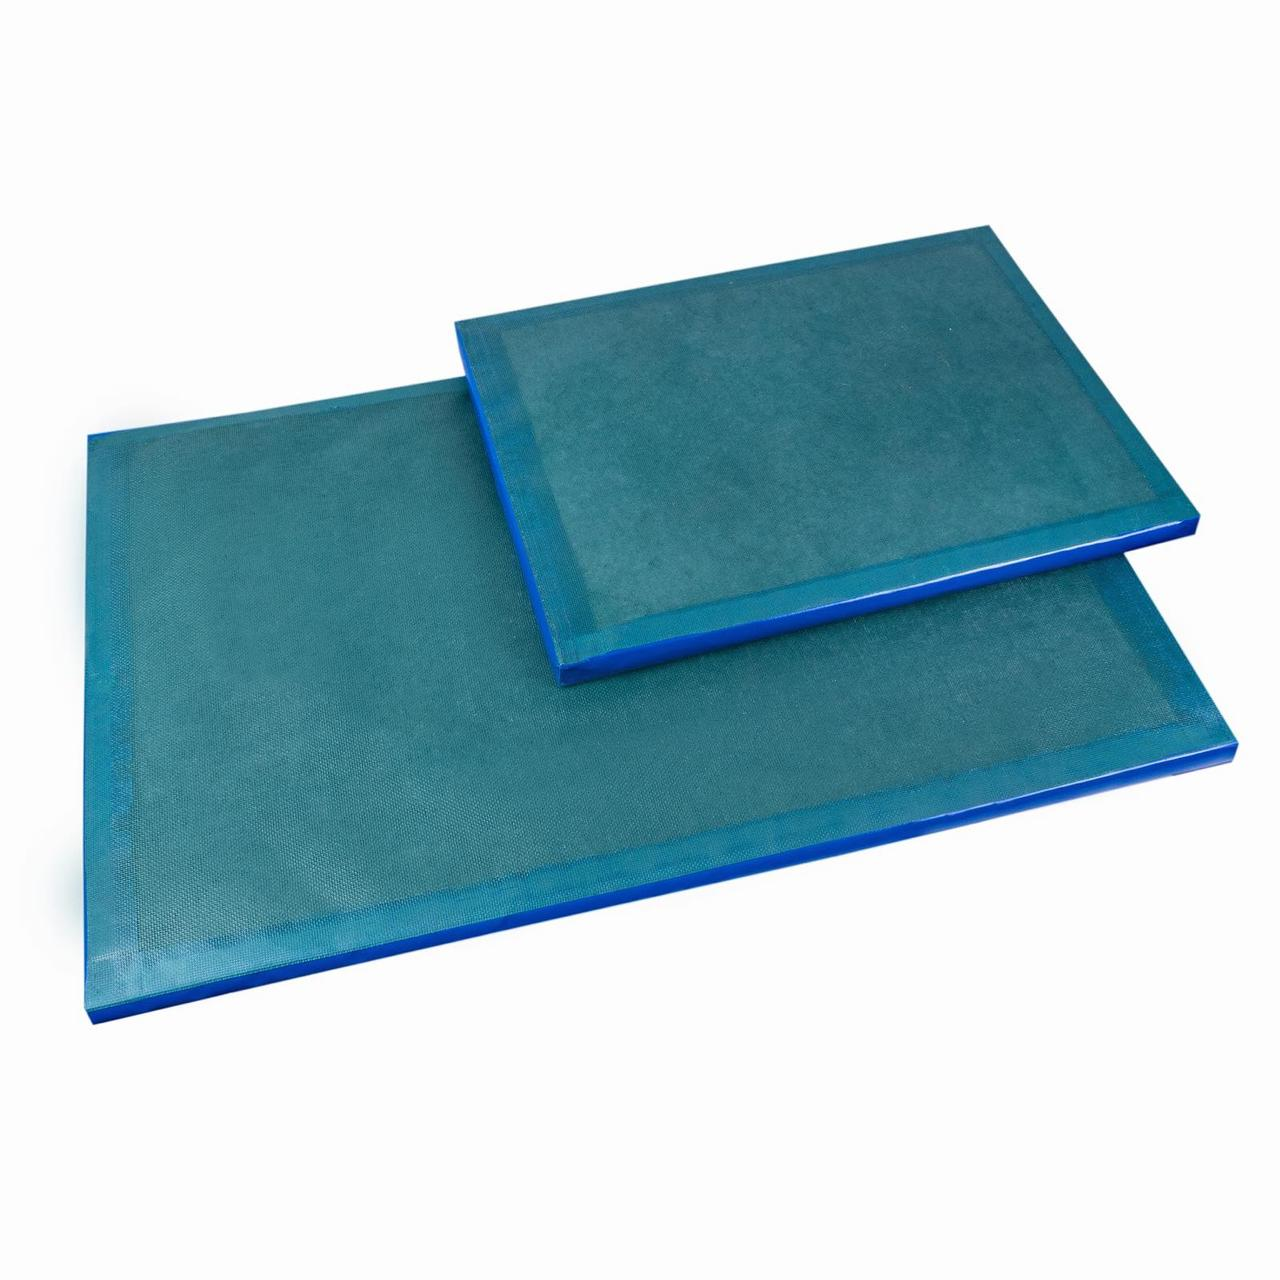 Офисный дезинфицирующий коврик 100х150х3 см